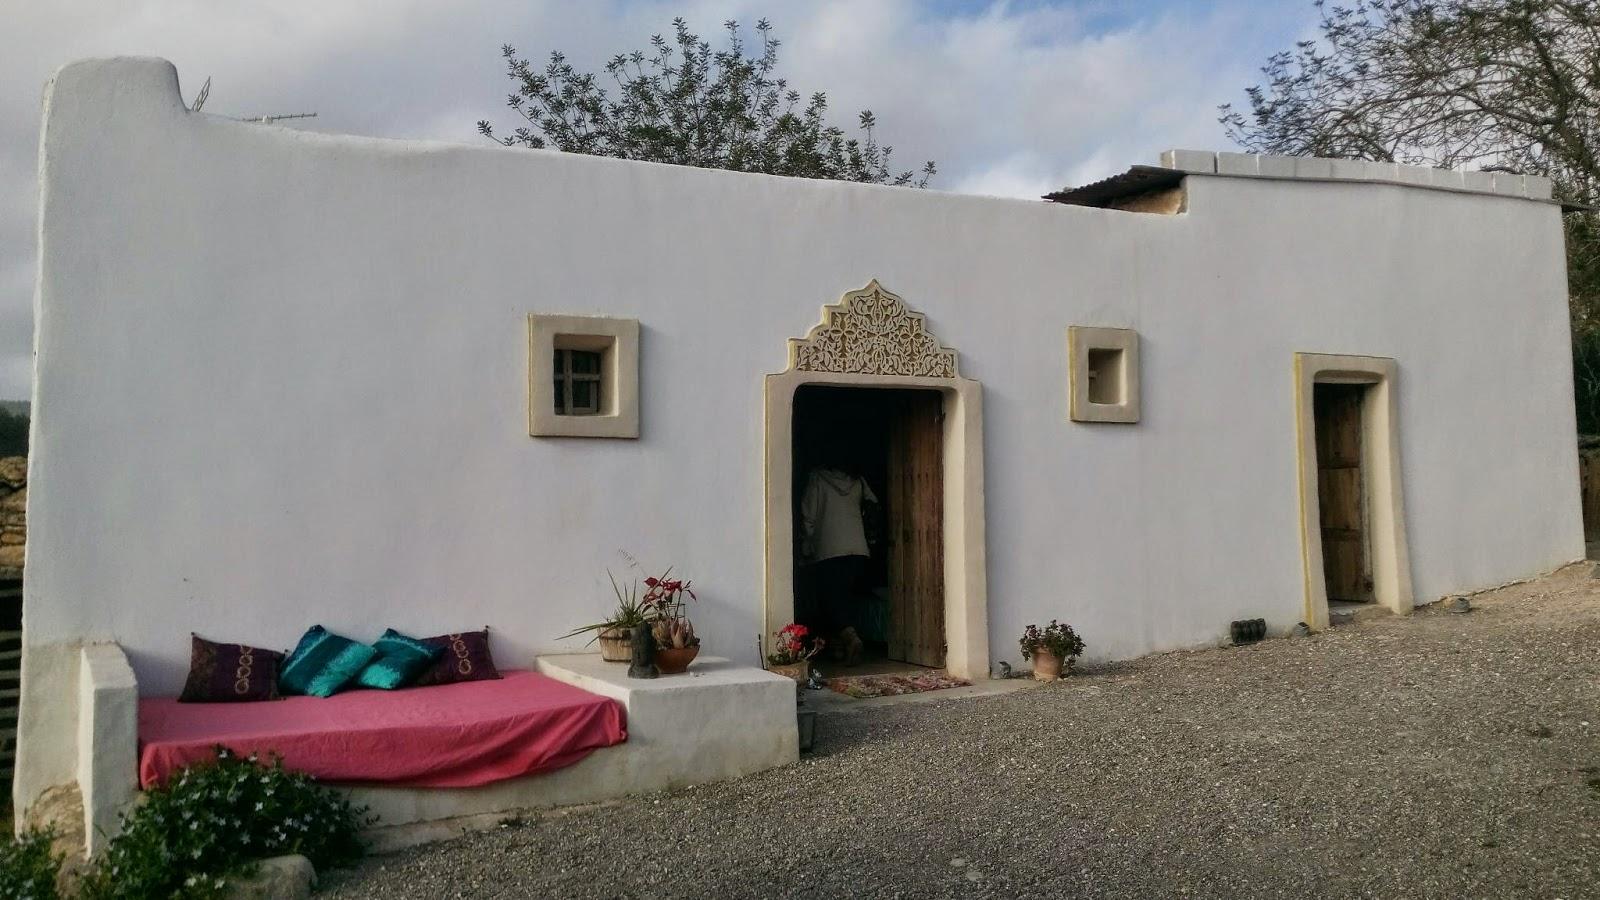 Roxire turismo rural en ibiza - Ibiza casas rurales ...